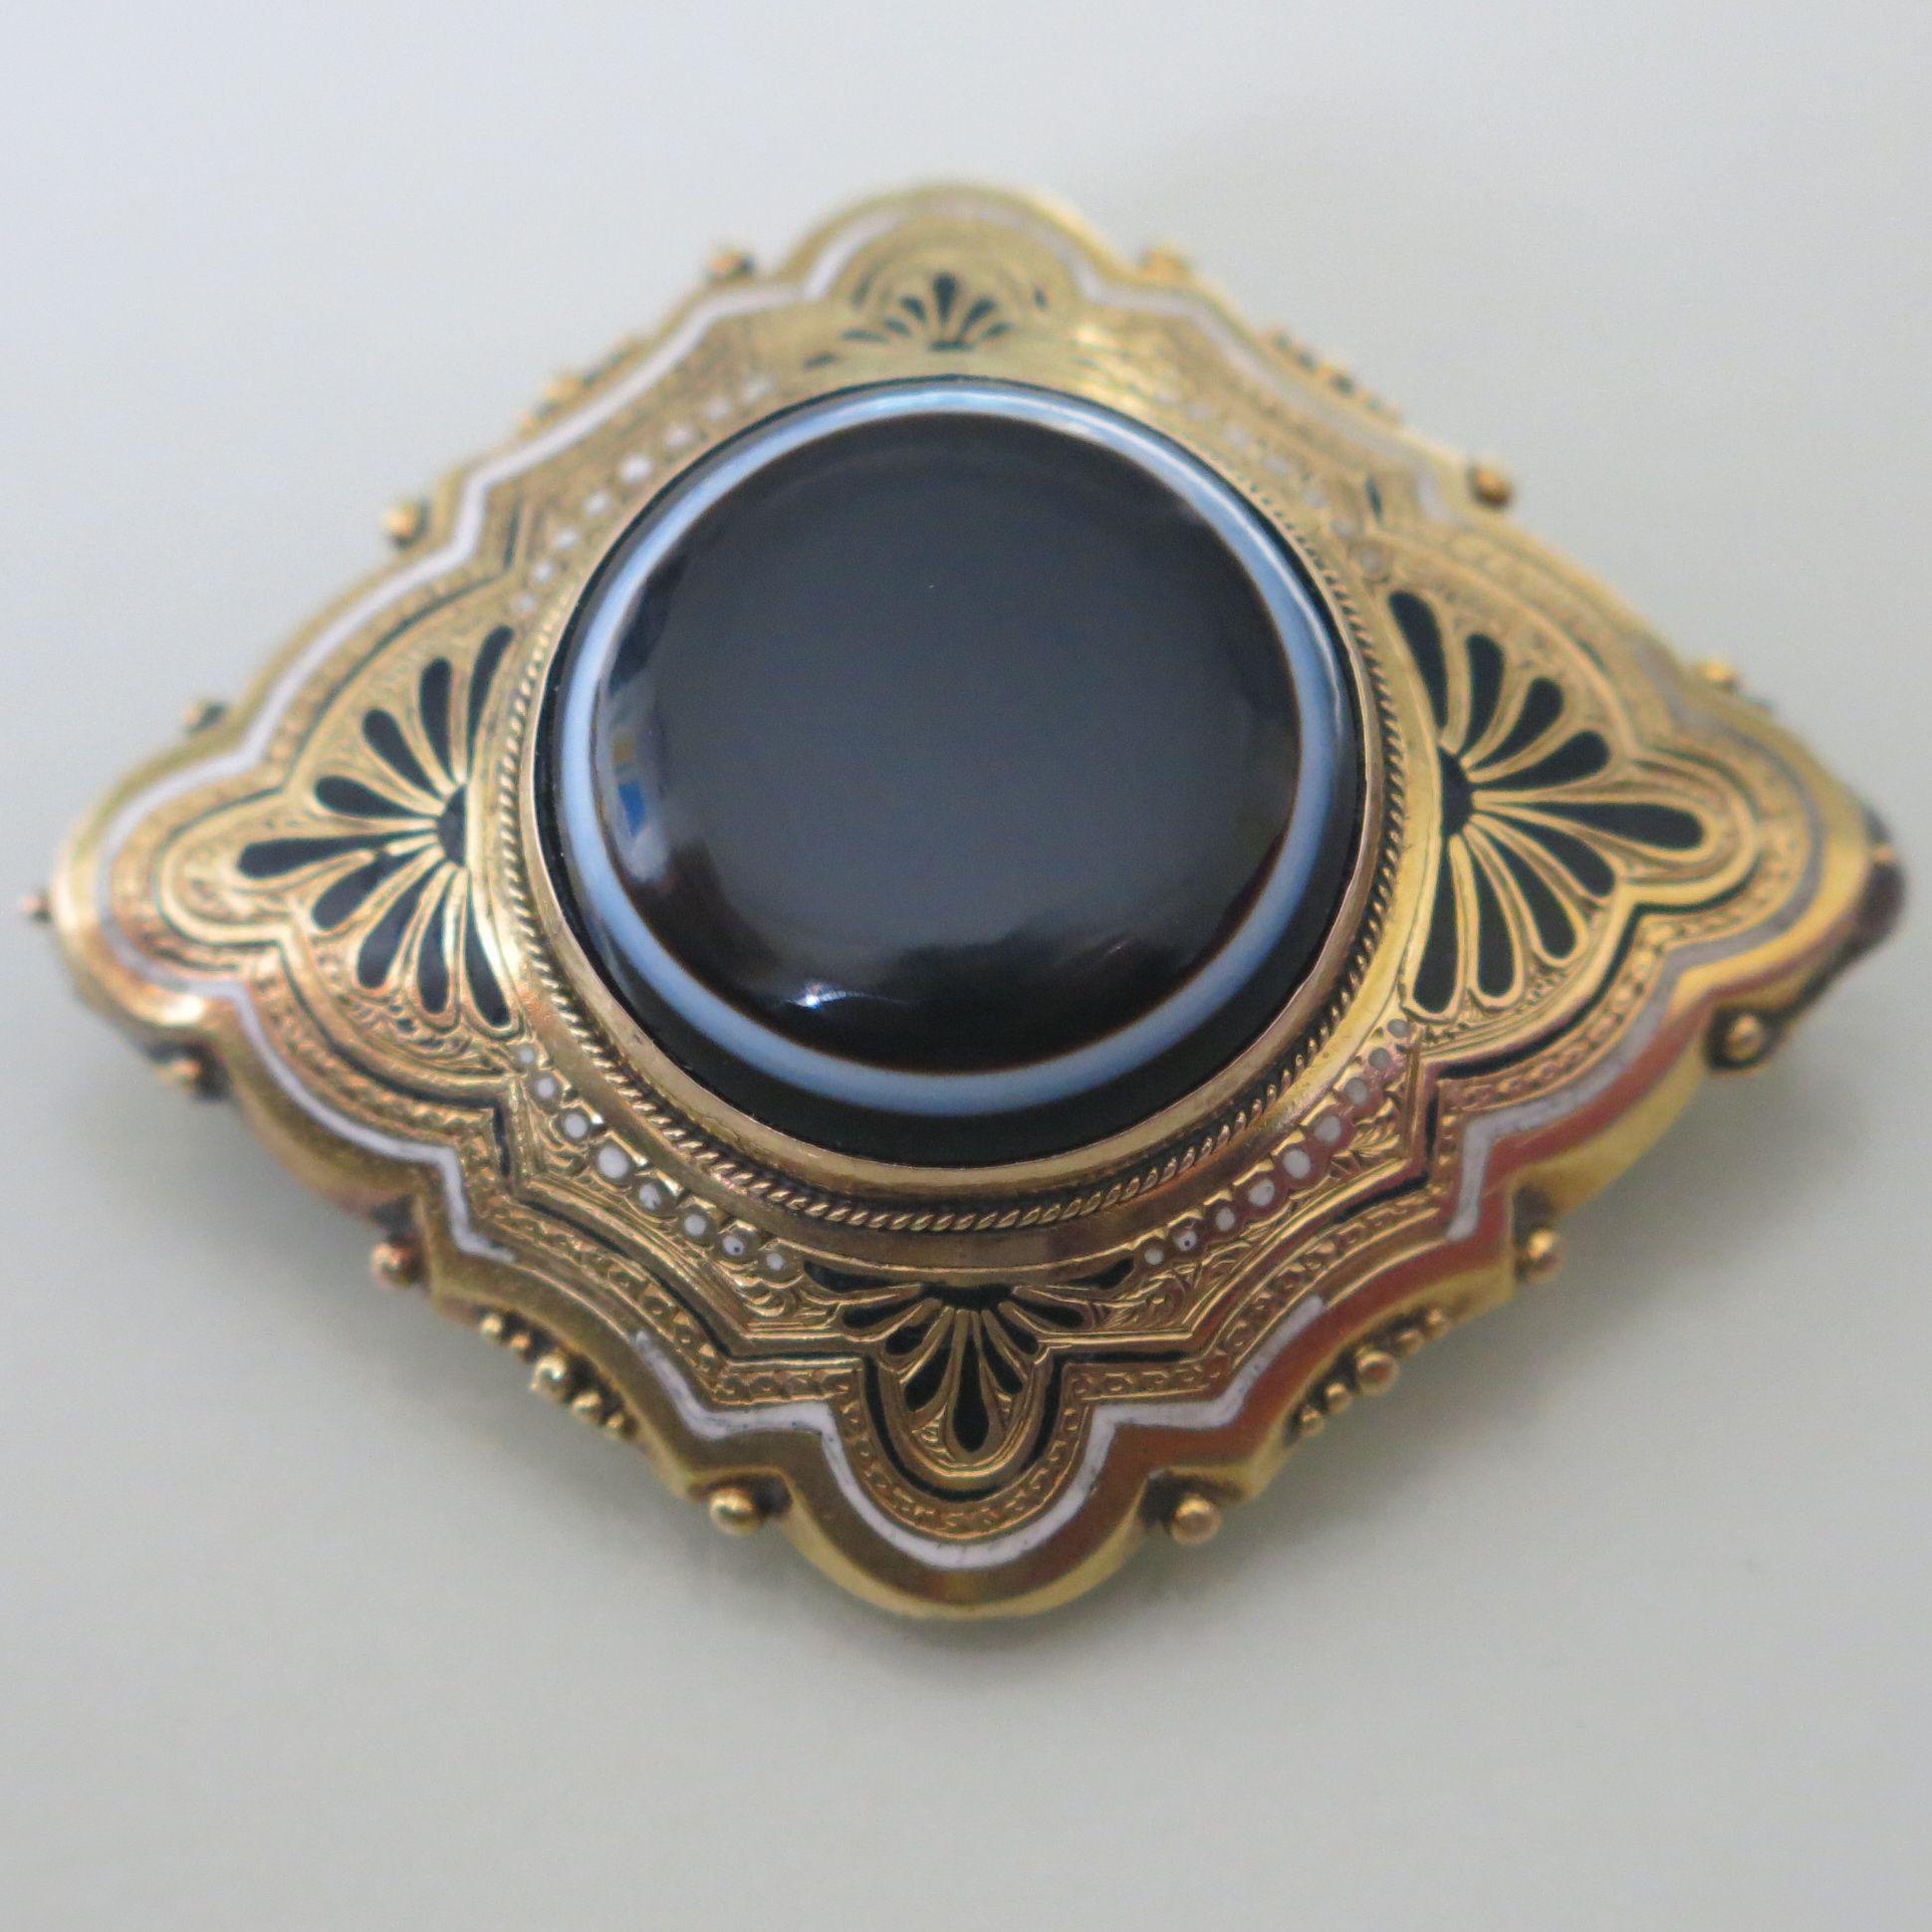 Antique Victorian Mourning Bullseye Agate Enamel Brooch Pin